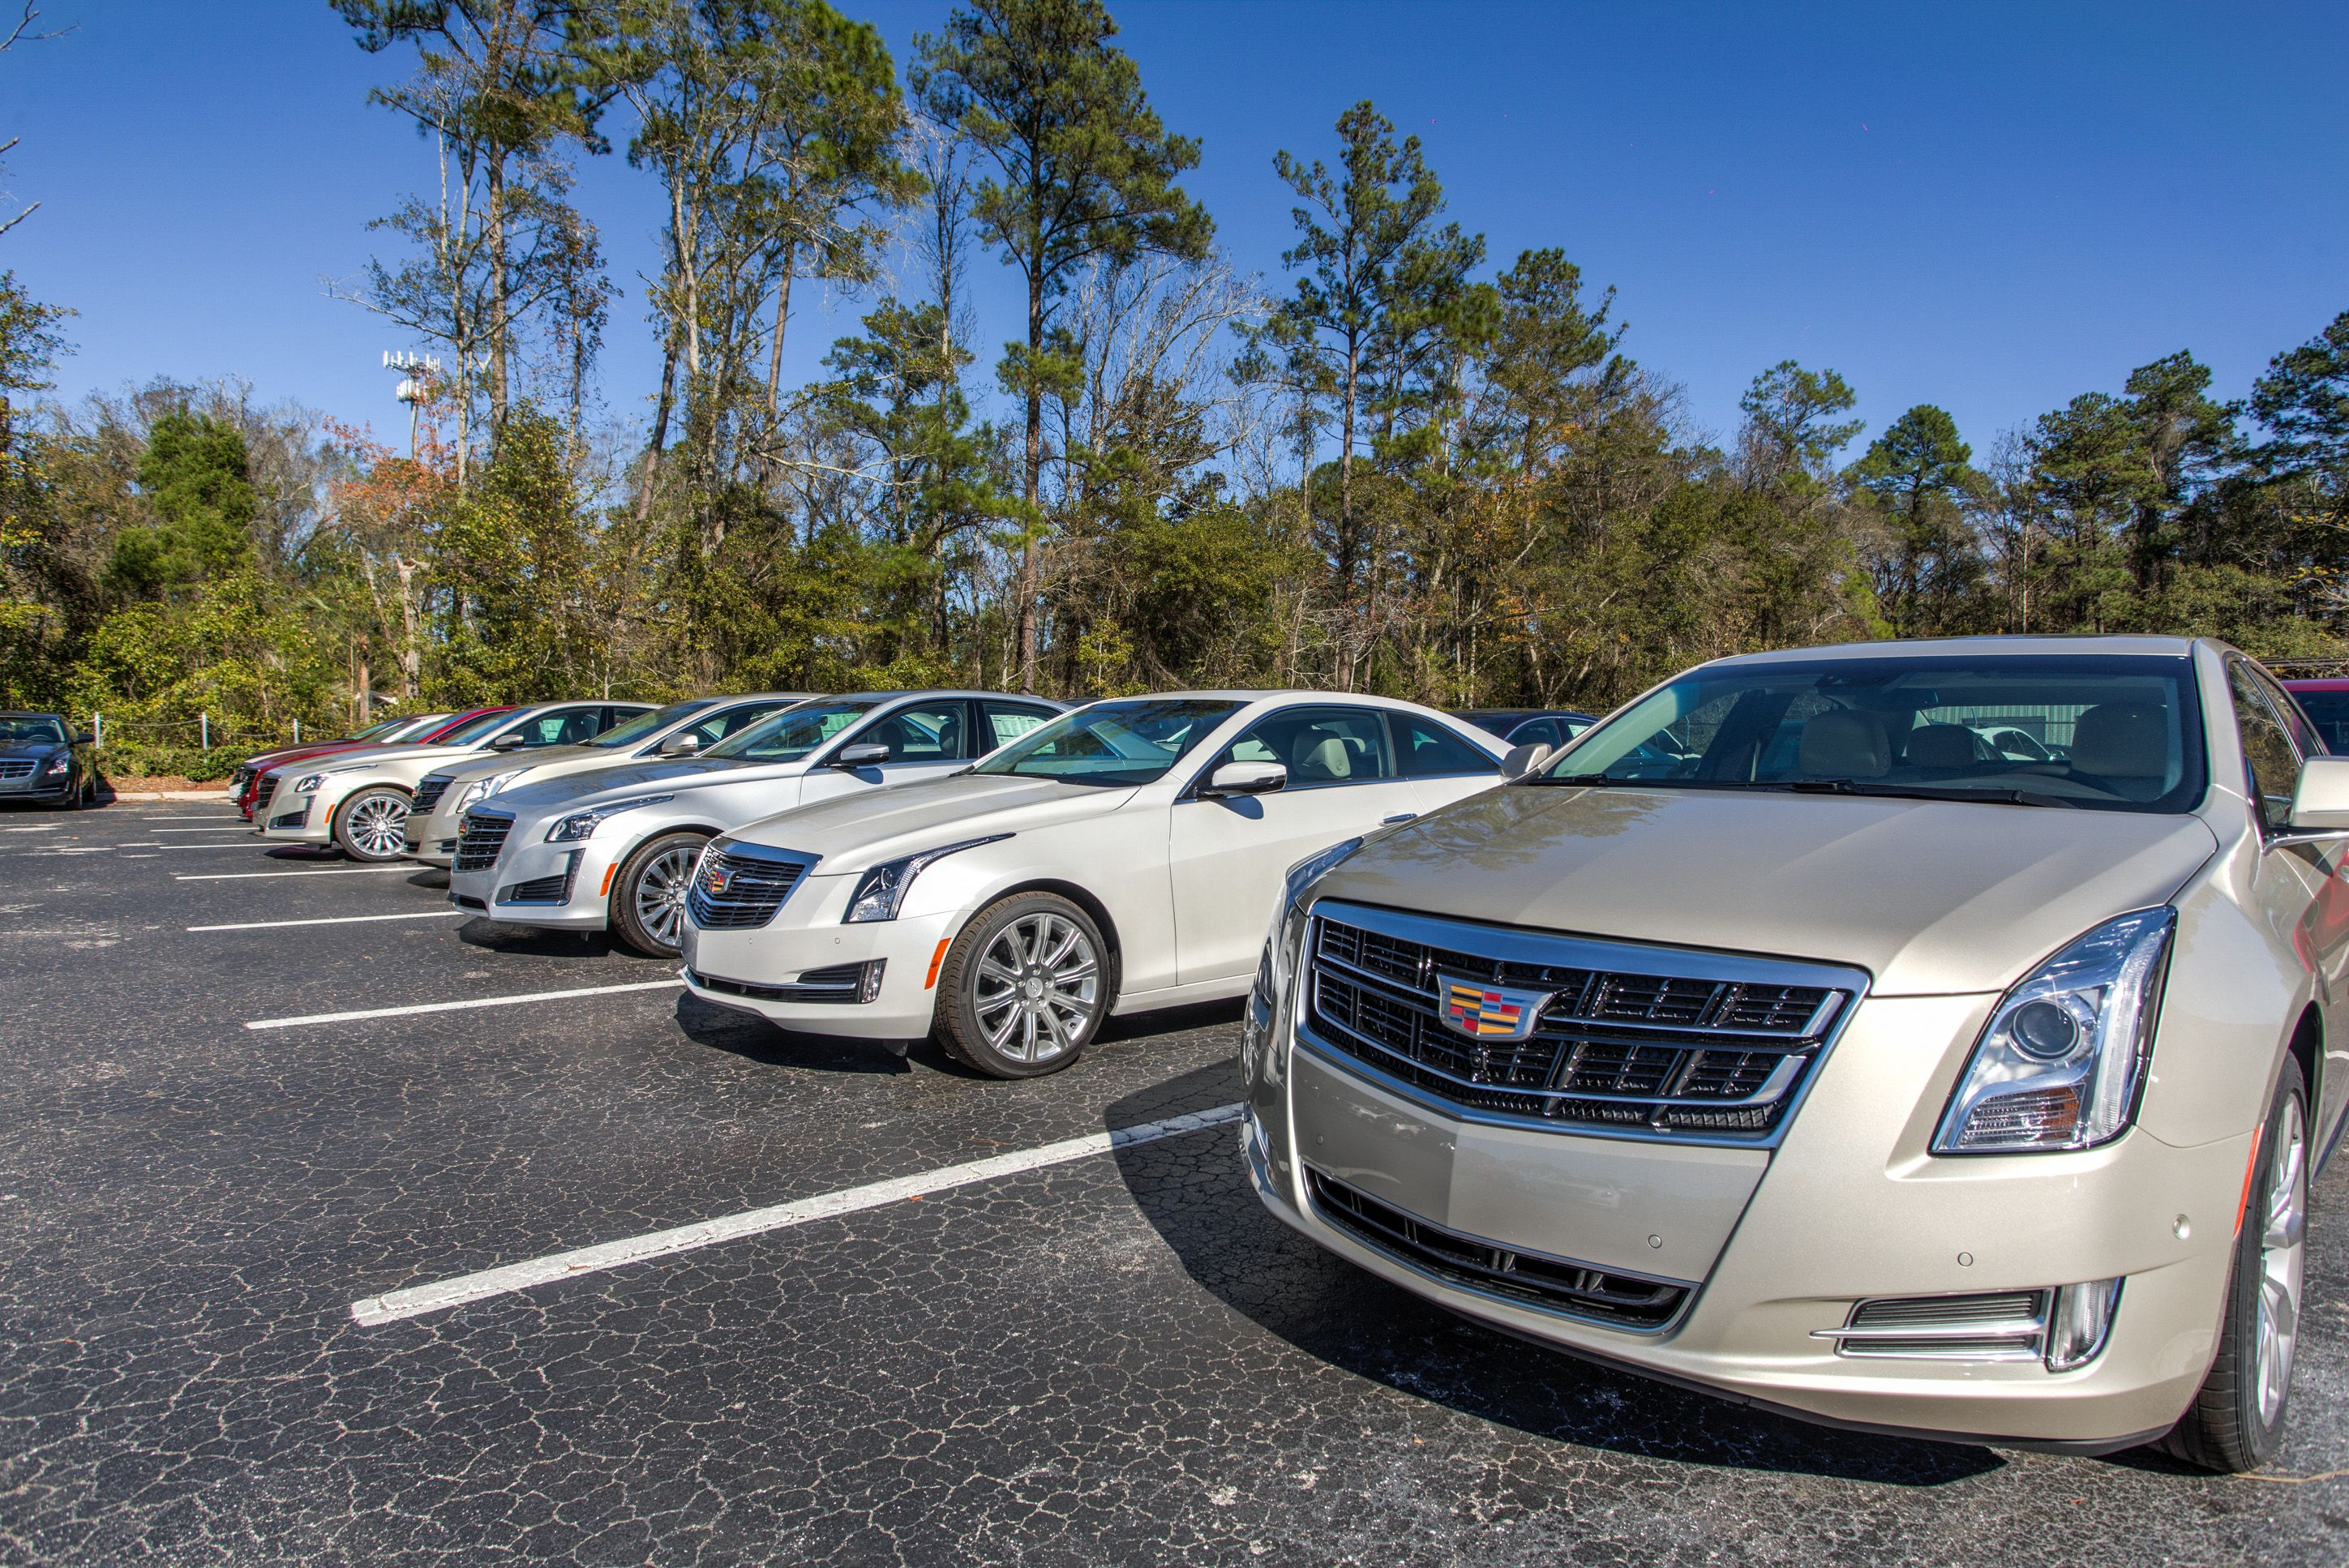 51 best Fields Cadillac Jacksonville images on Pinterest